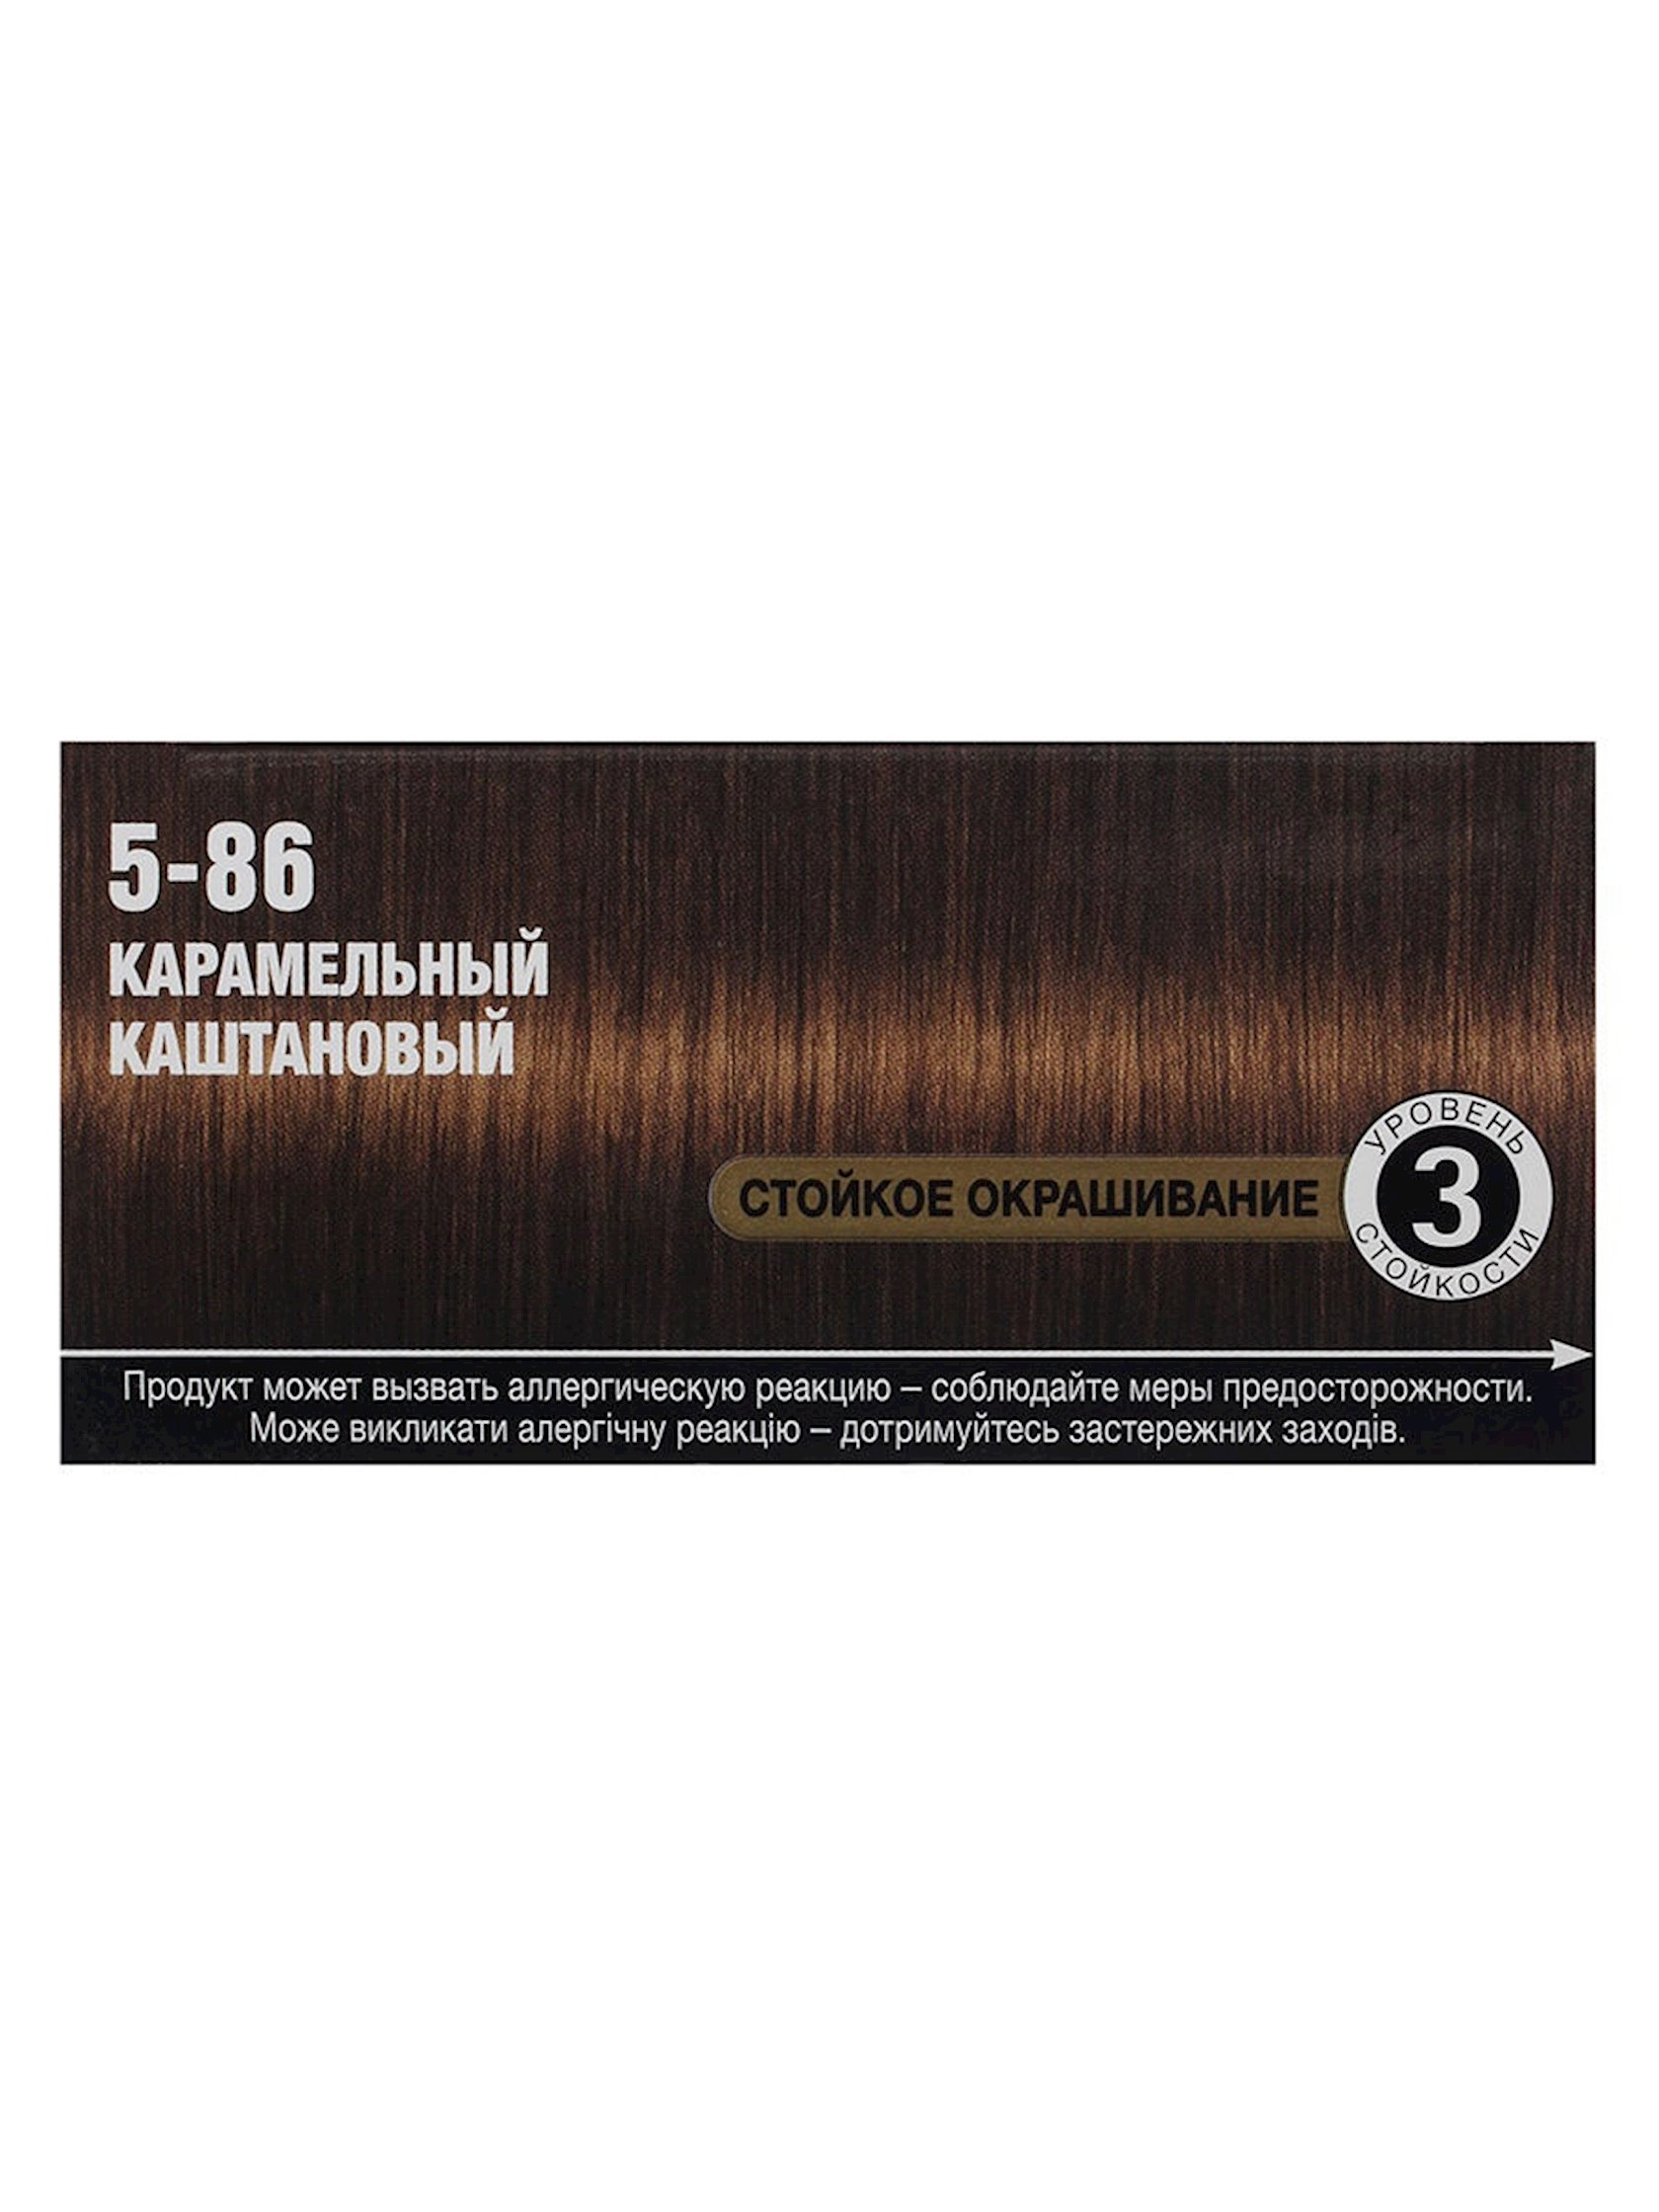 Saç üçün qalıcı krem-boya Syoss Oleo İntense ammonyaksız 5.86 Karamelli şabalıd